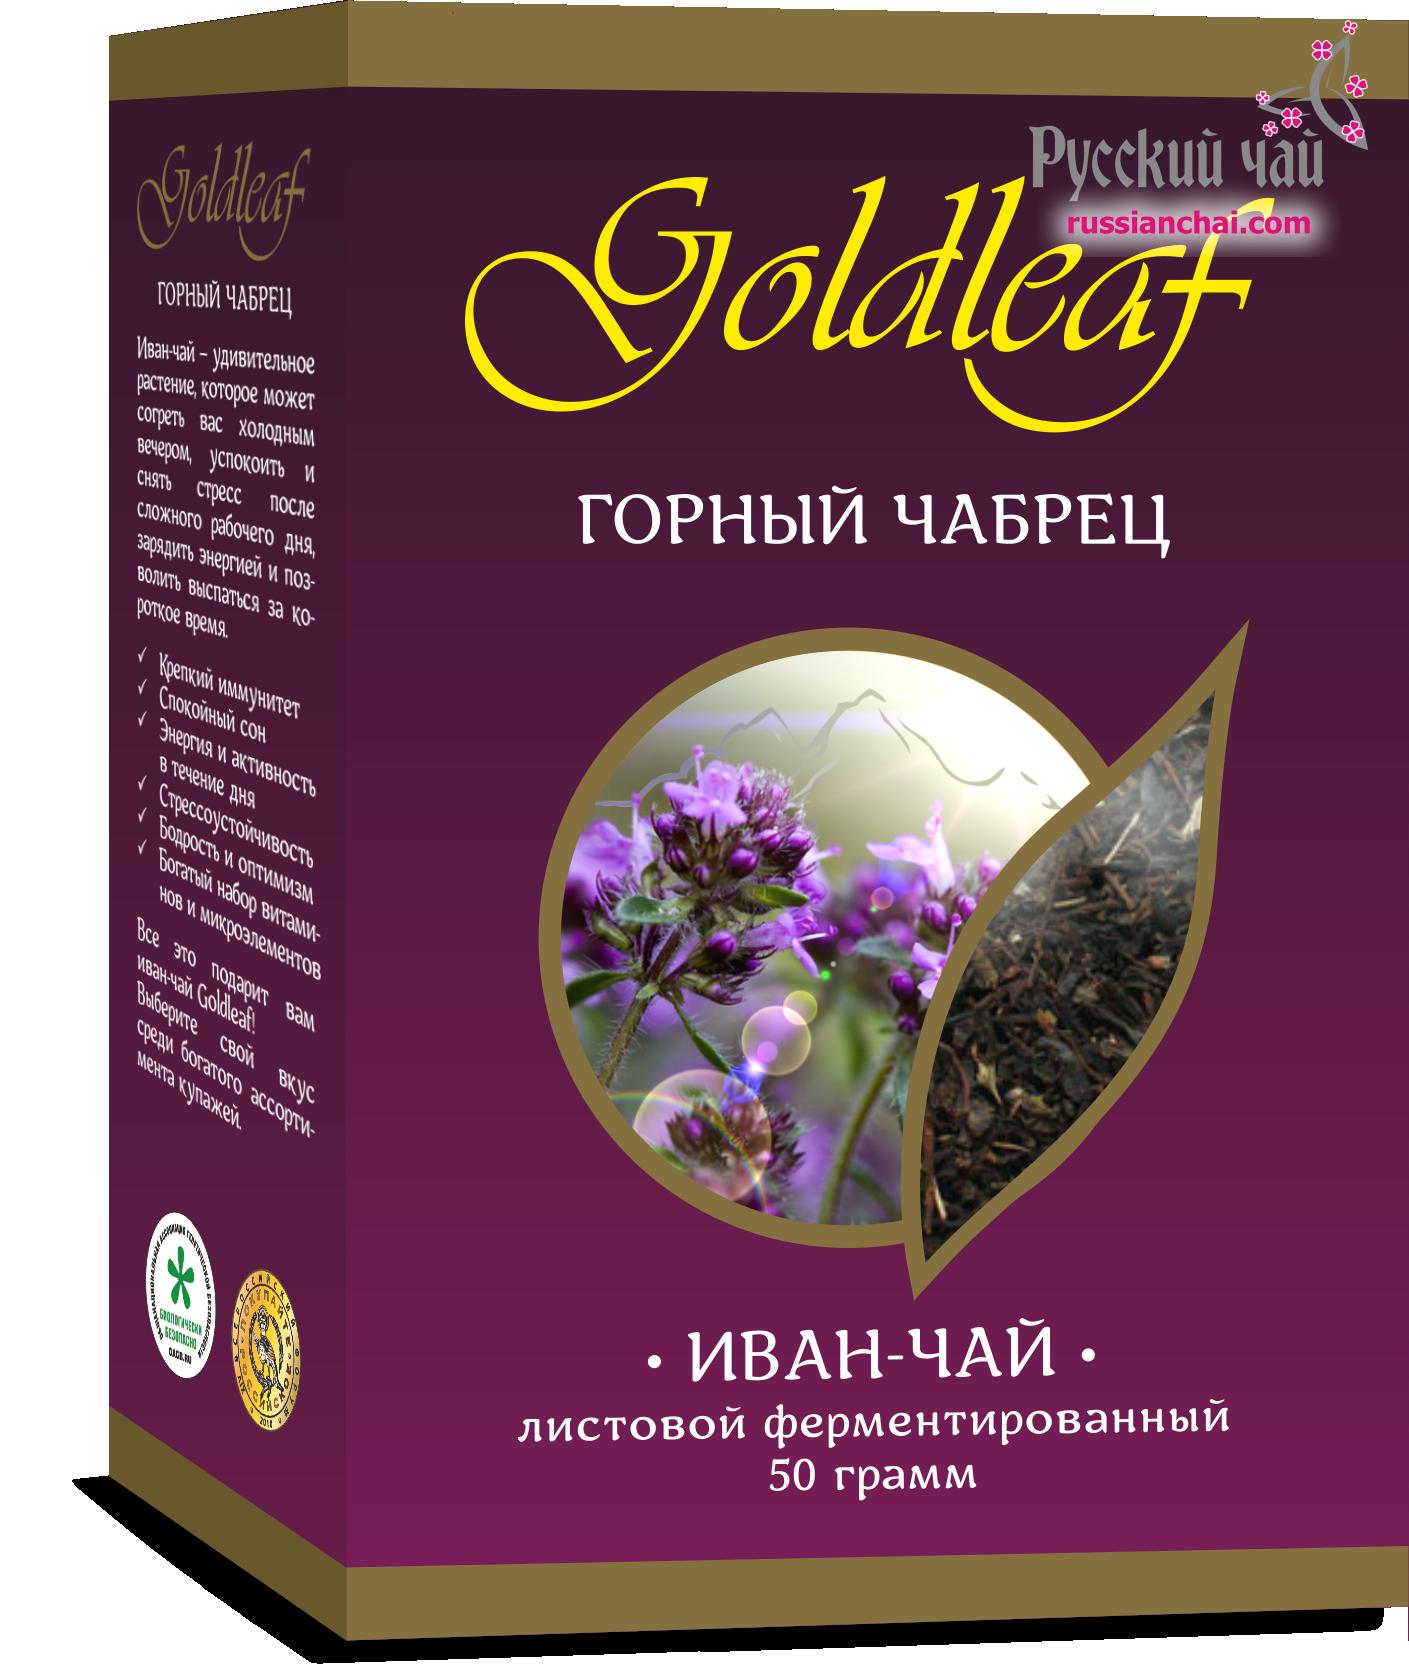 Иван-чай «Горный чабрец»